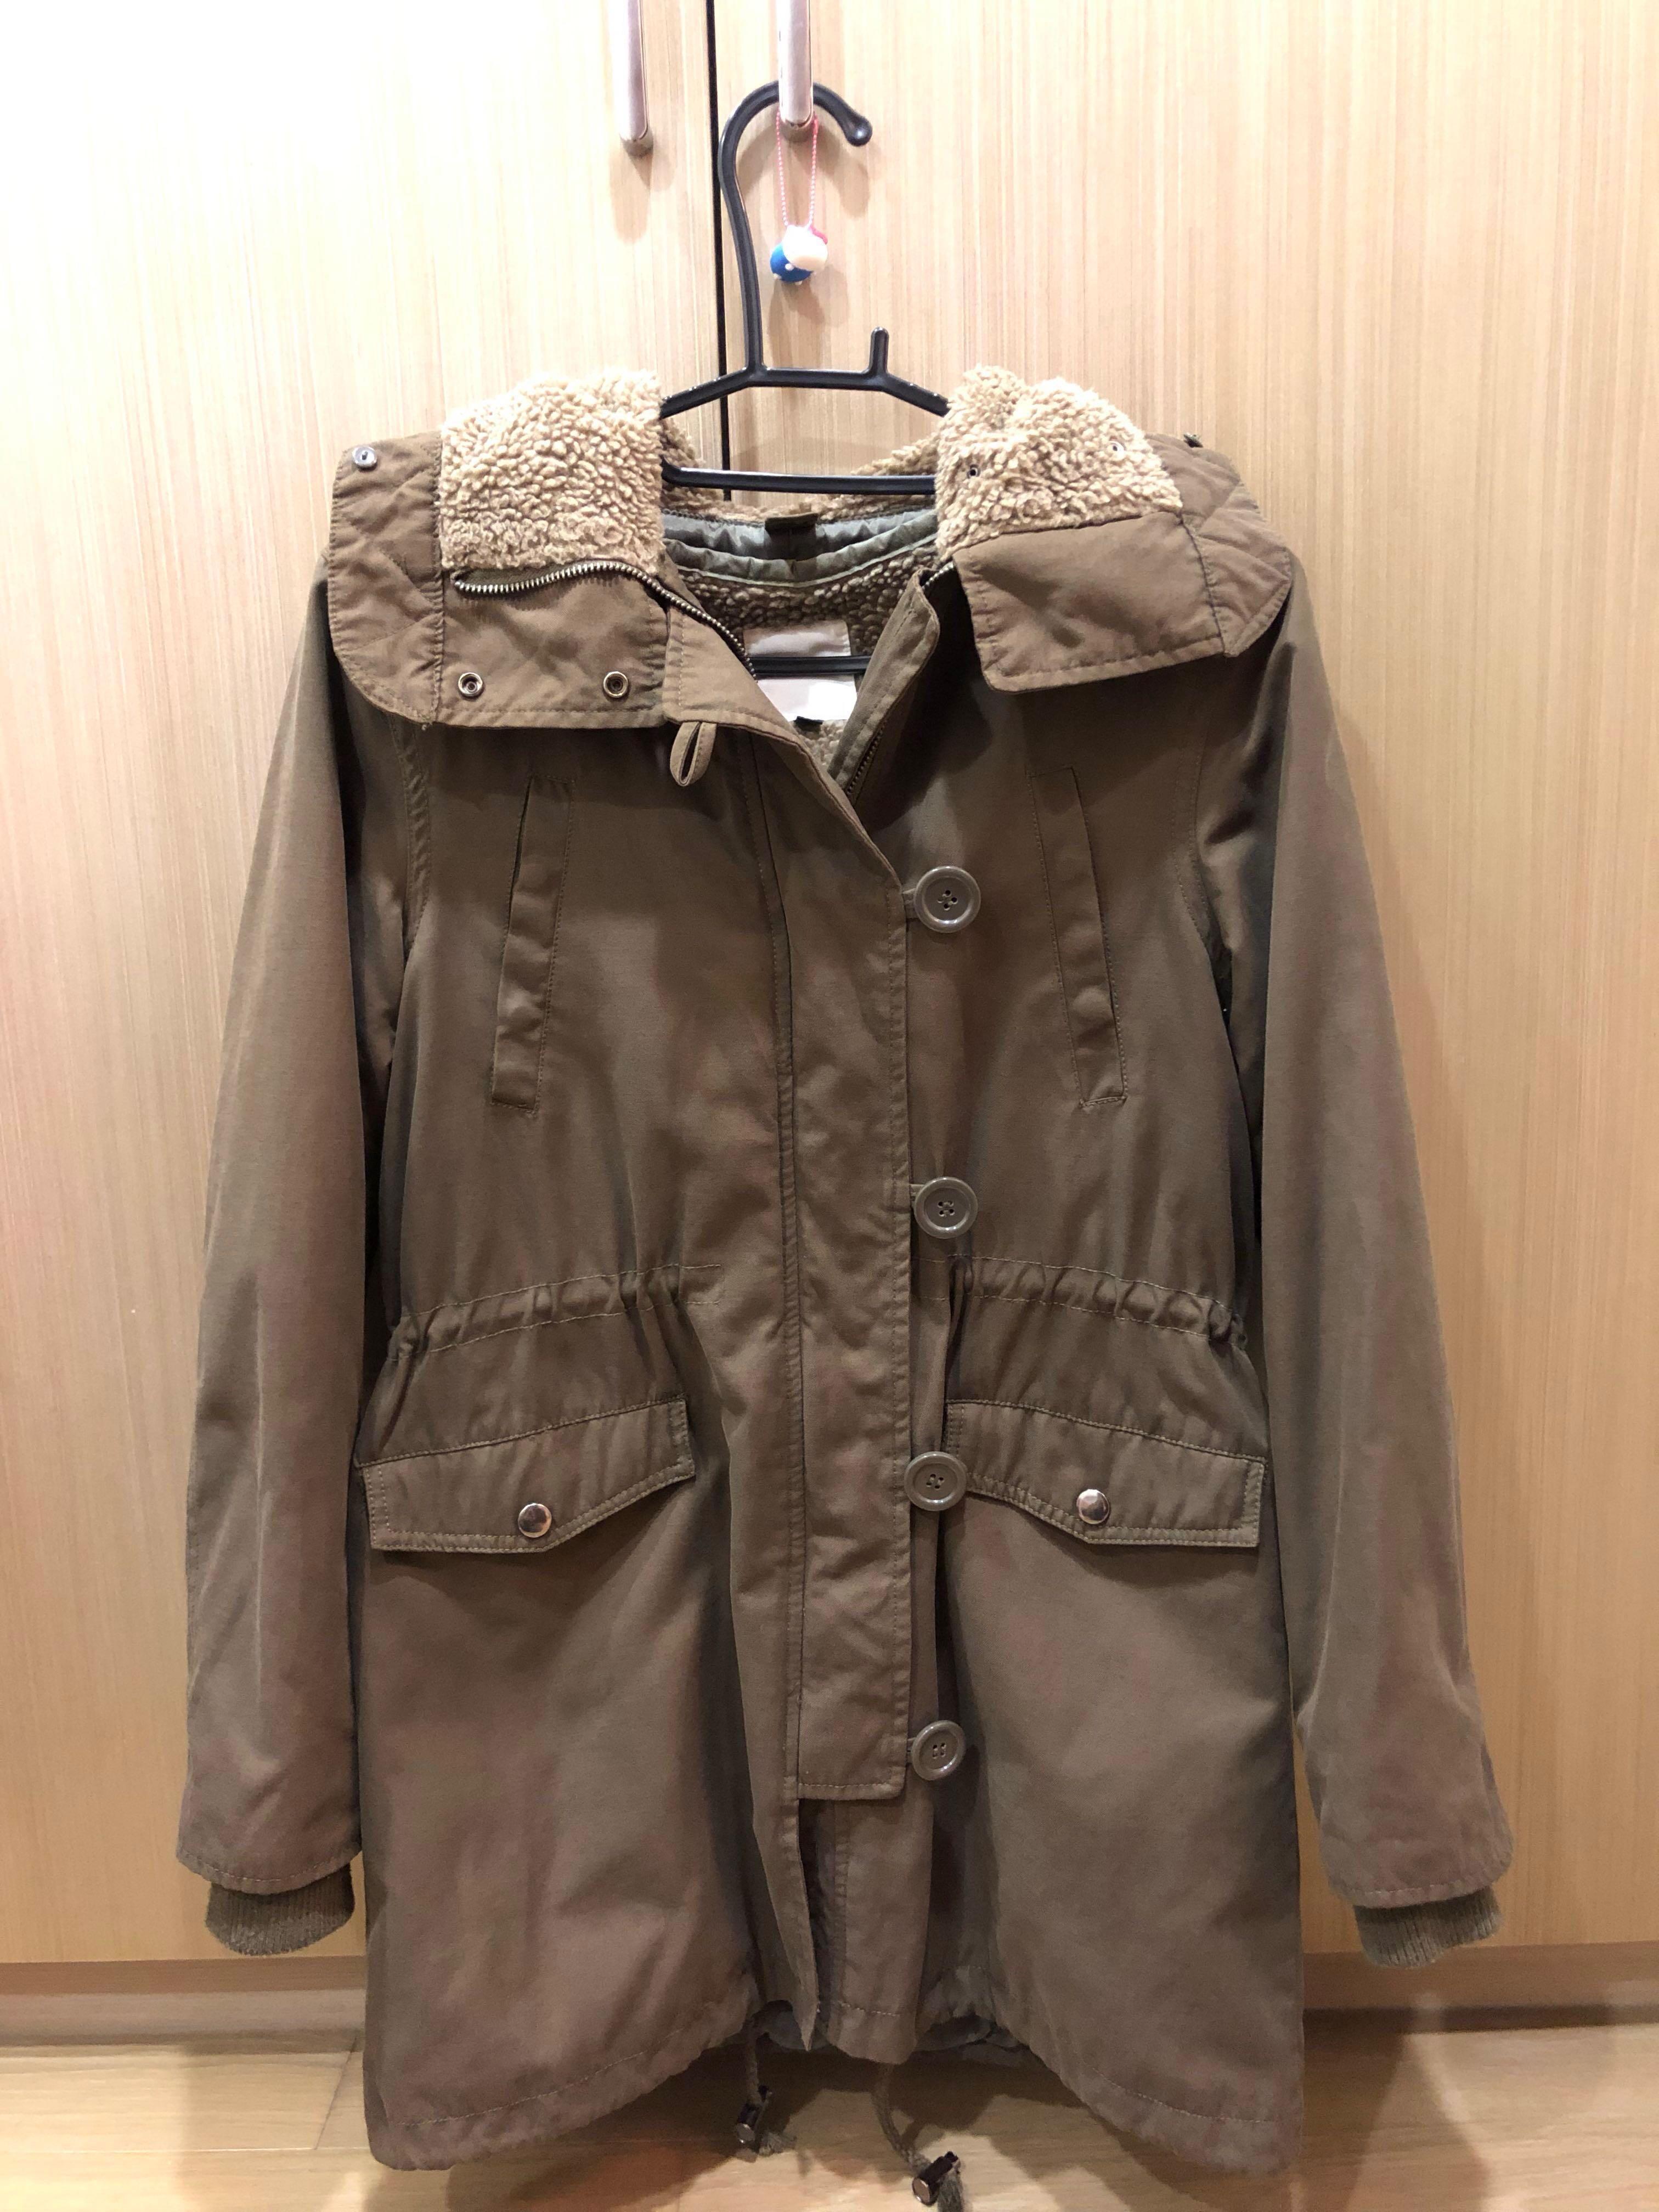 Lowrys Farm 軍綠色 軍外套 大衣 外套 M號 降價~